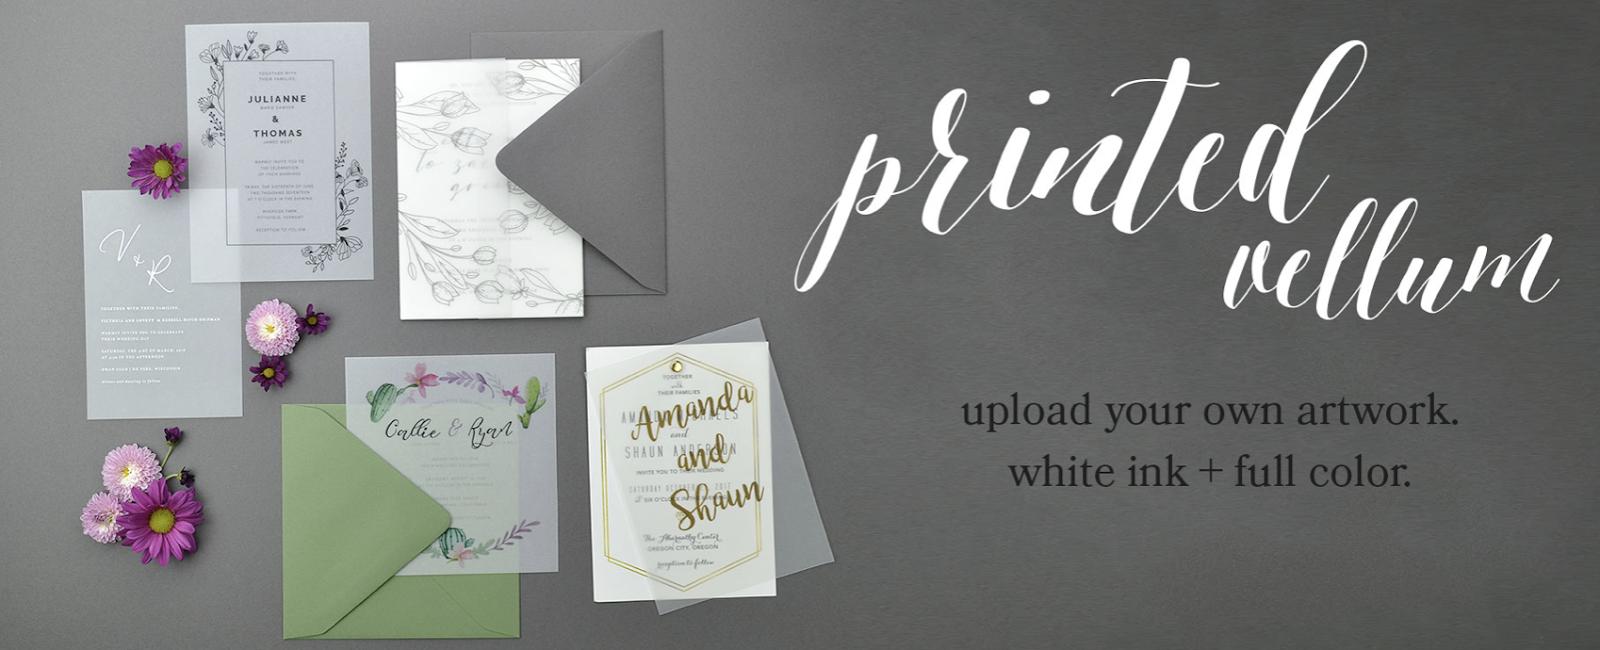 vellum paper wedding invites by Cards & Pockets